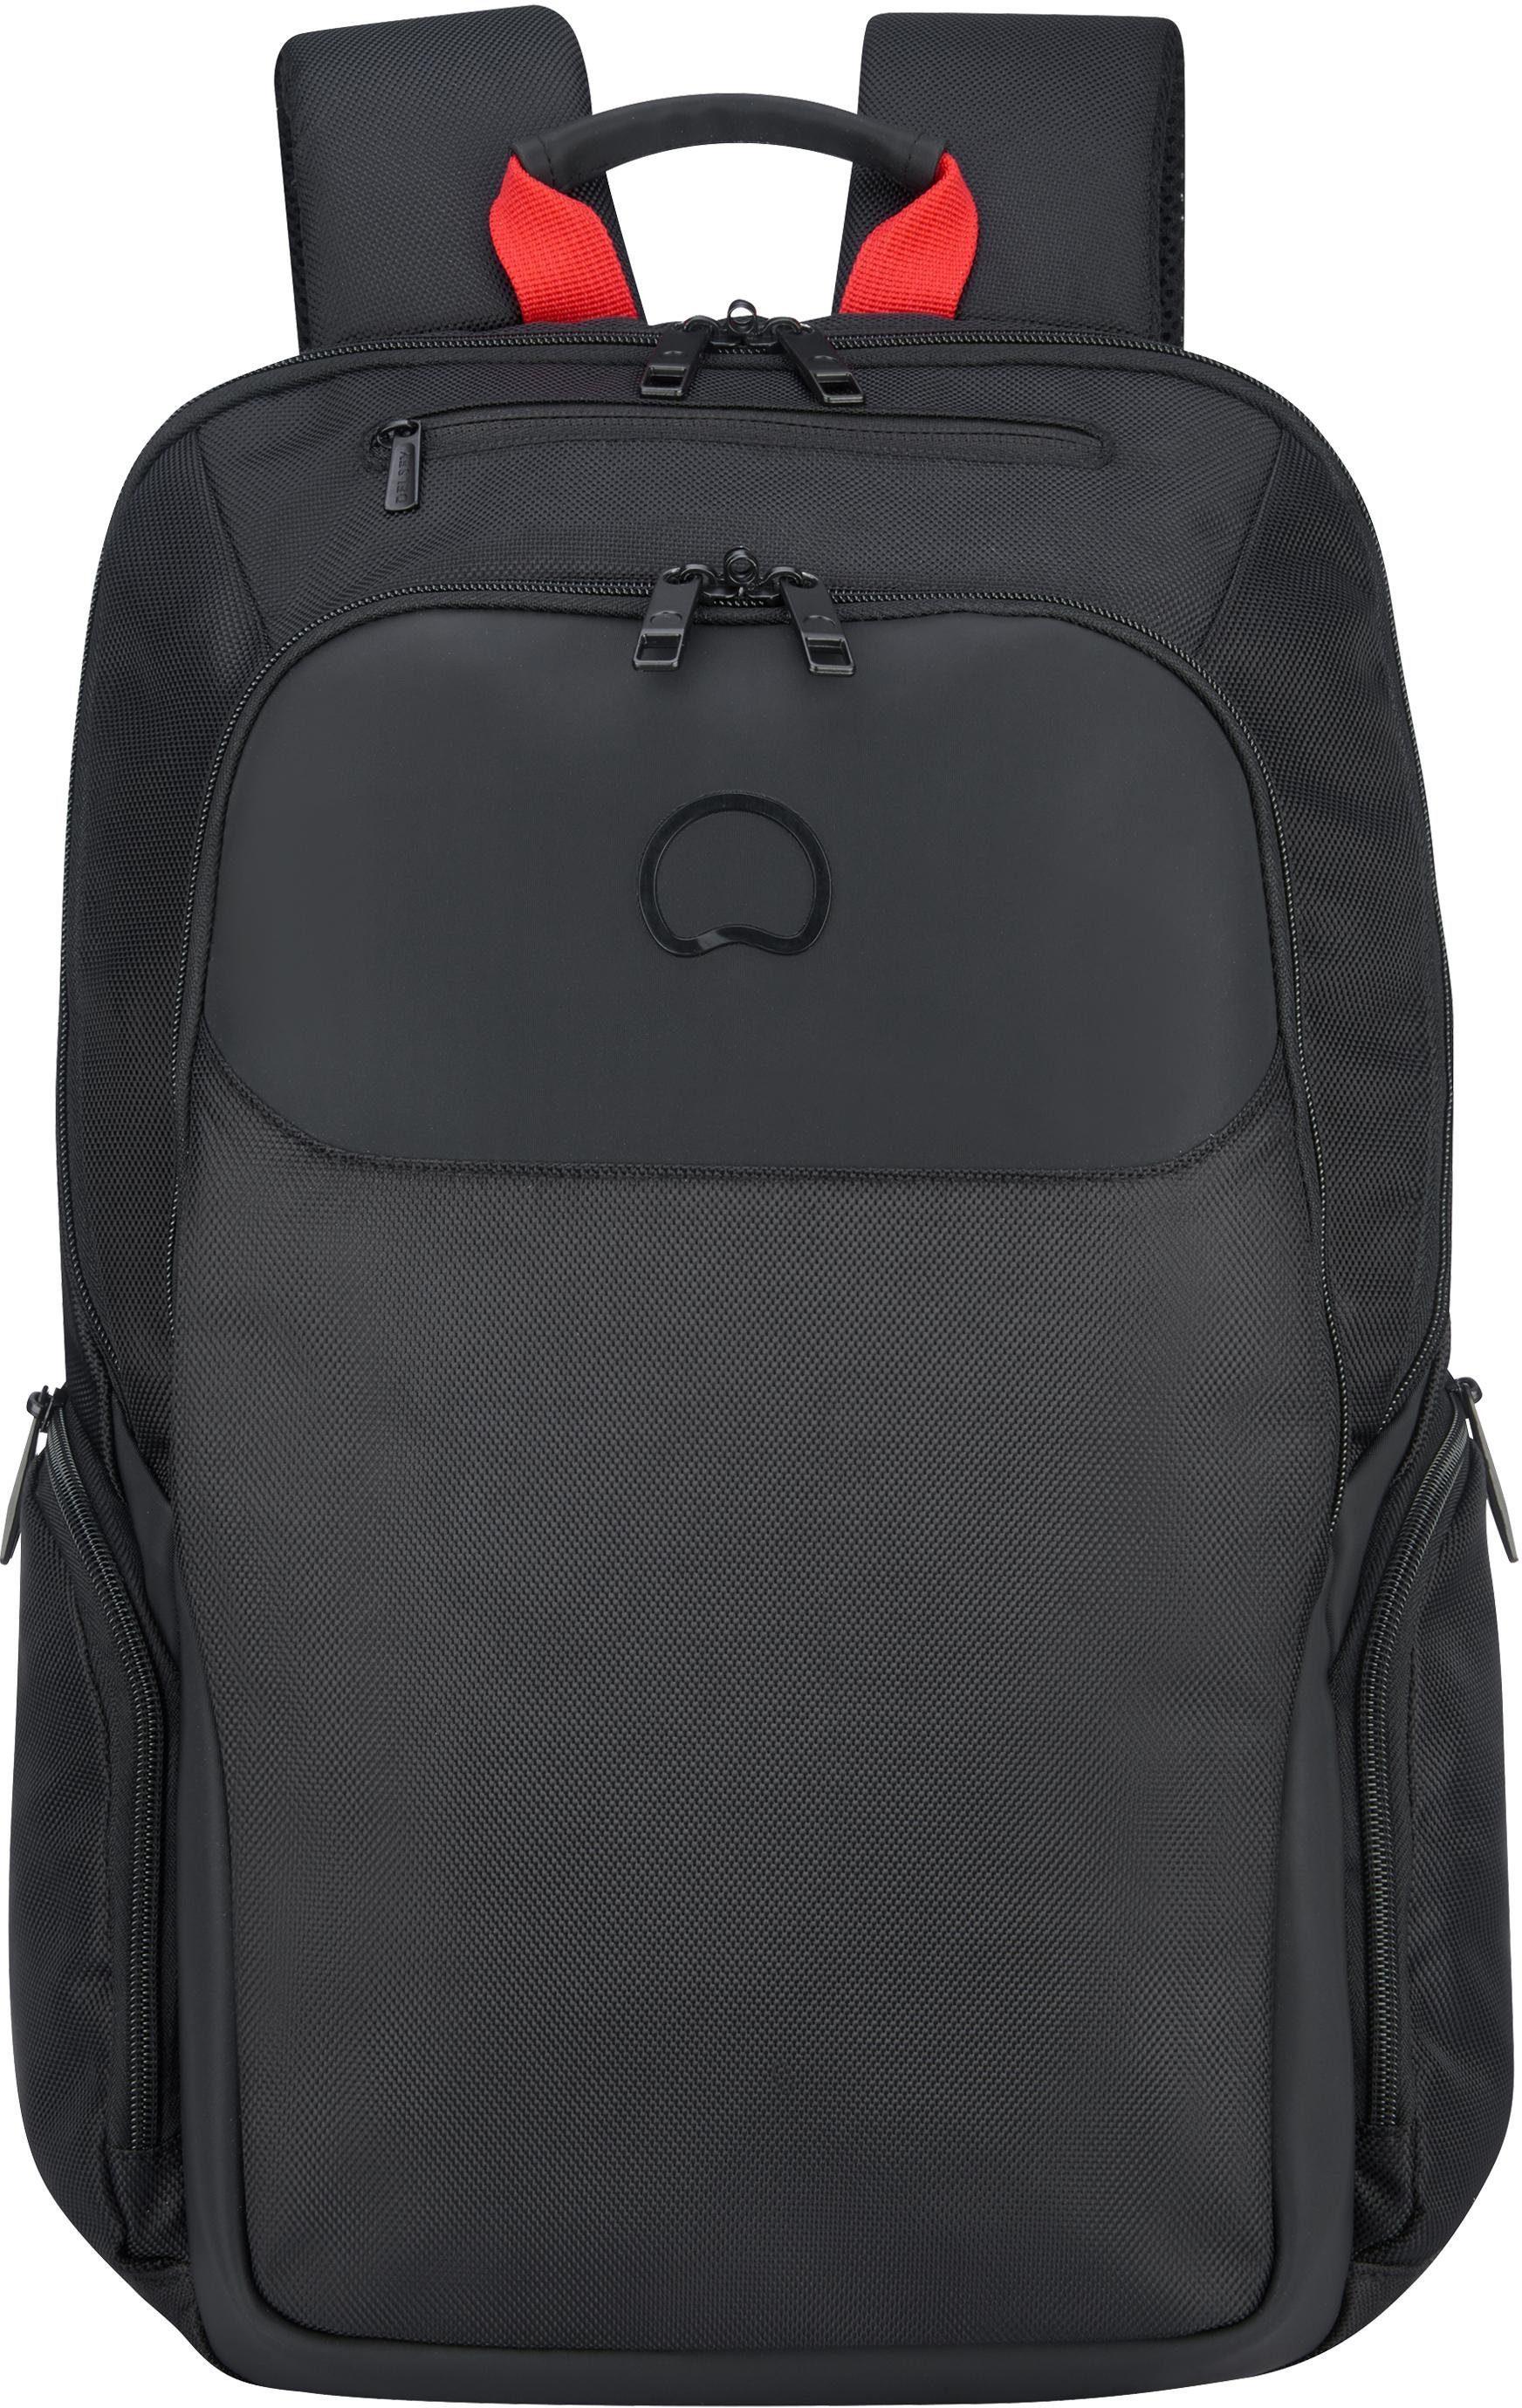 DELSEY Rucksack mit 15,6 Zoll Laptopfach, »Parvis Plus«